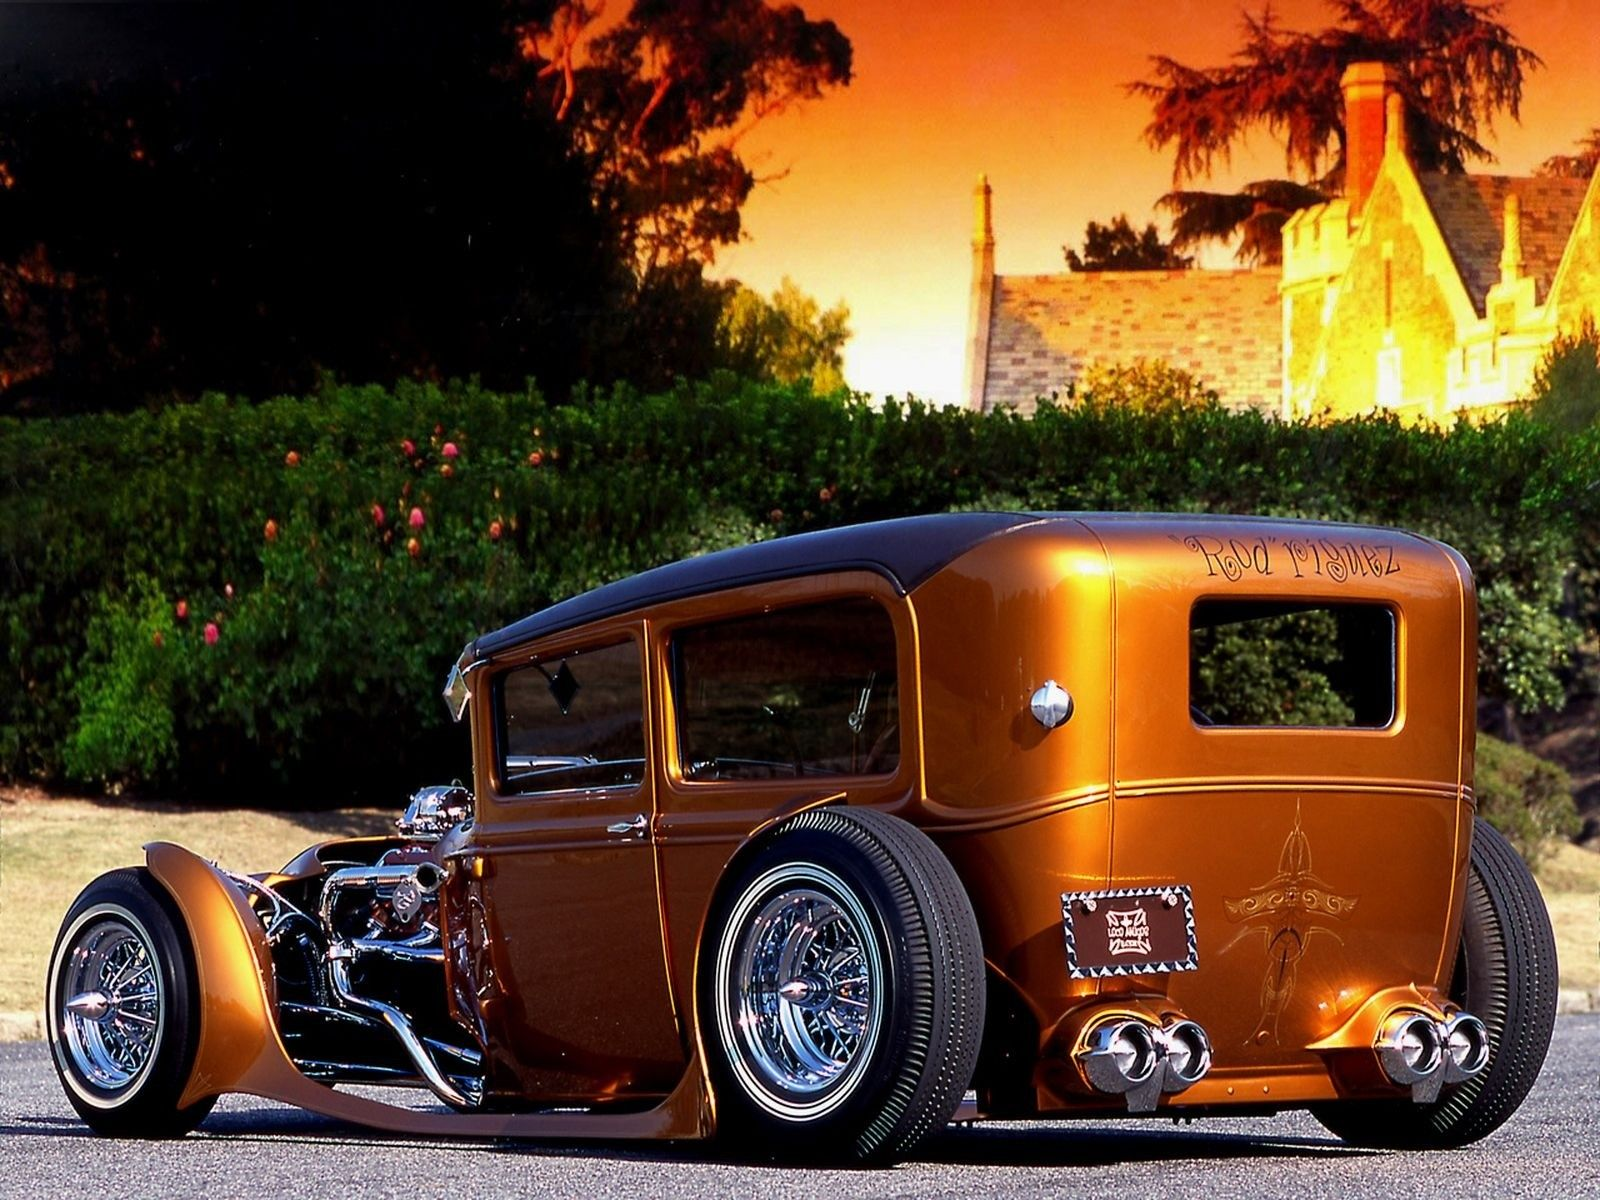 Hot Rod Wallpaper Photos Gallery Kx0641d0gw 1600x1200 Px 43351 KB Cars